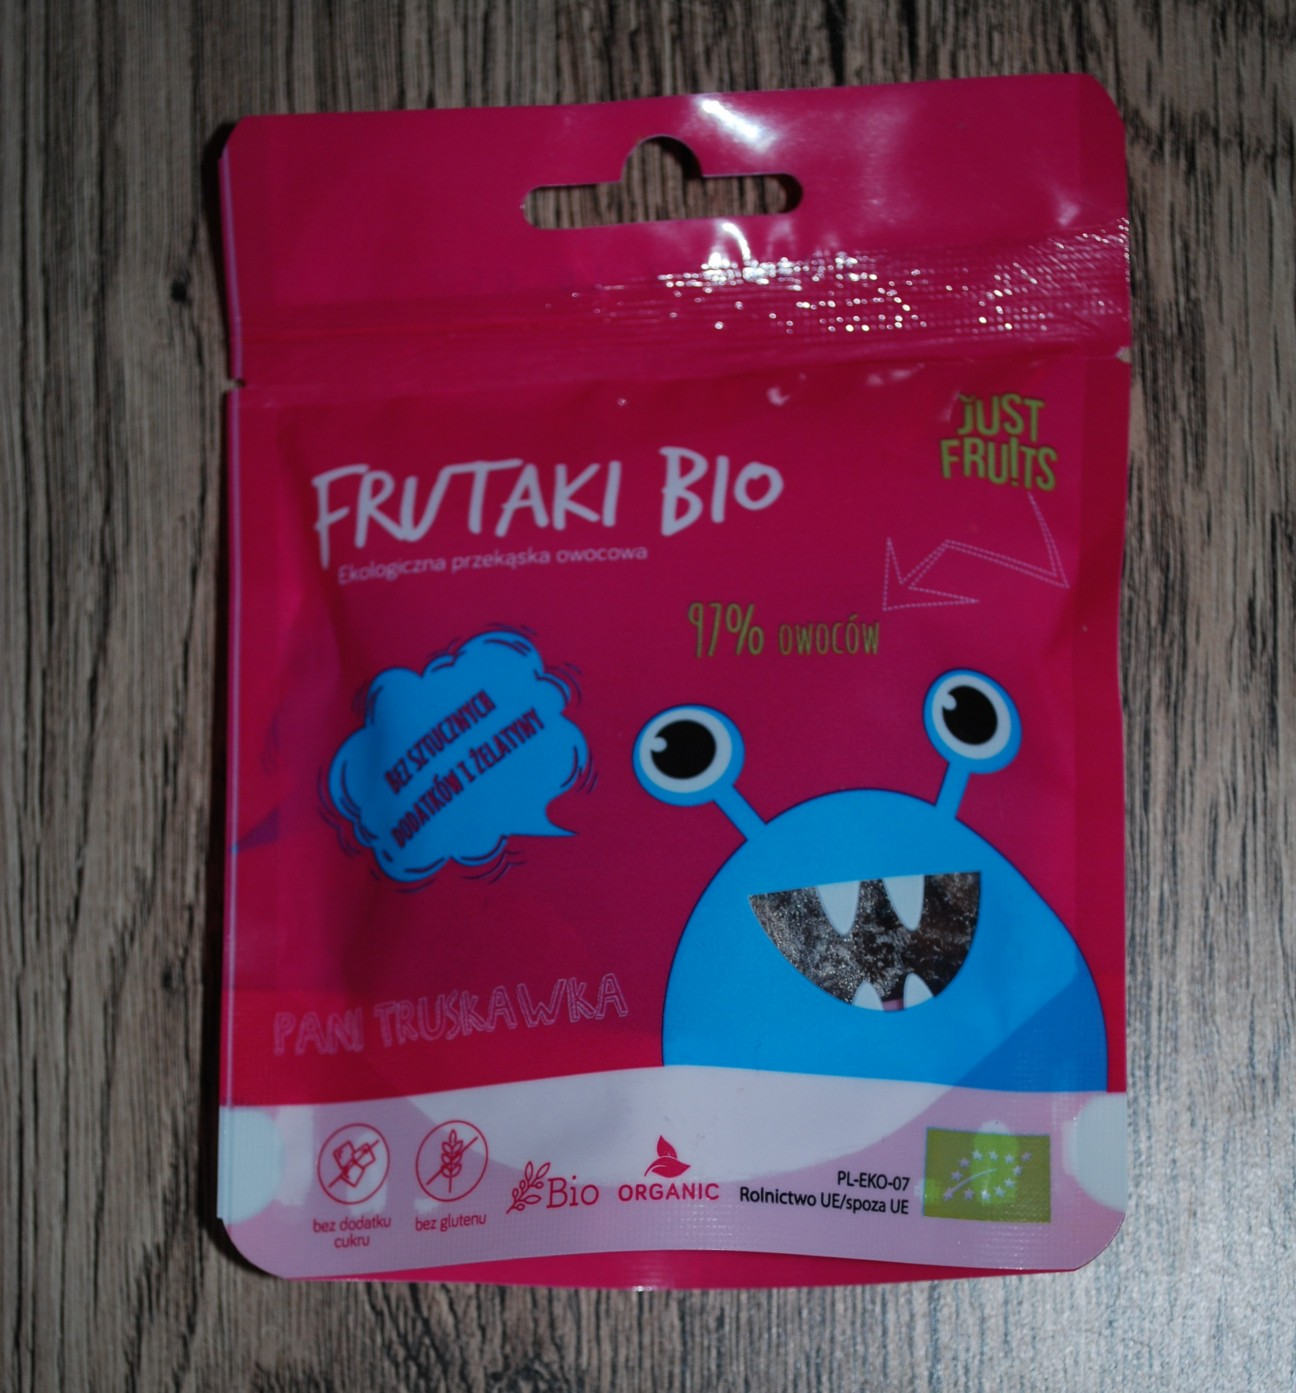 Pyszne naturalne żelki – Frutaki Bio